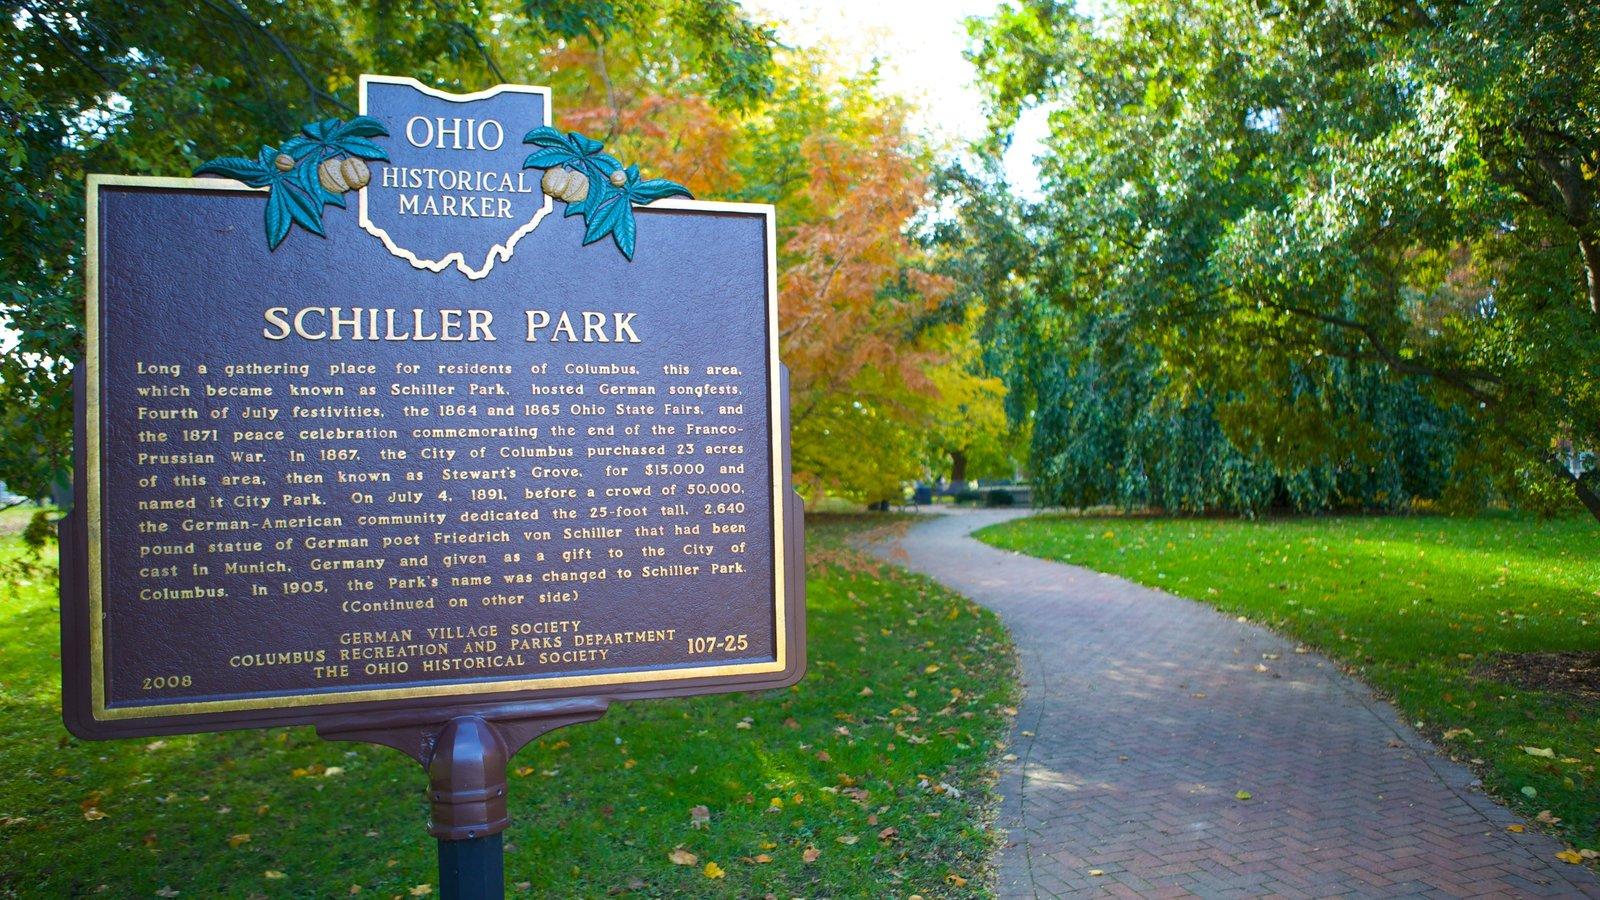 Schiller Park showing a garden and signage